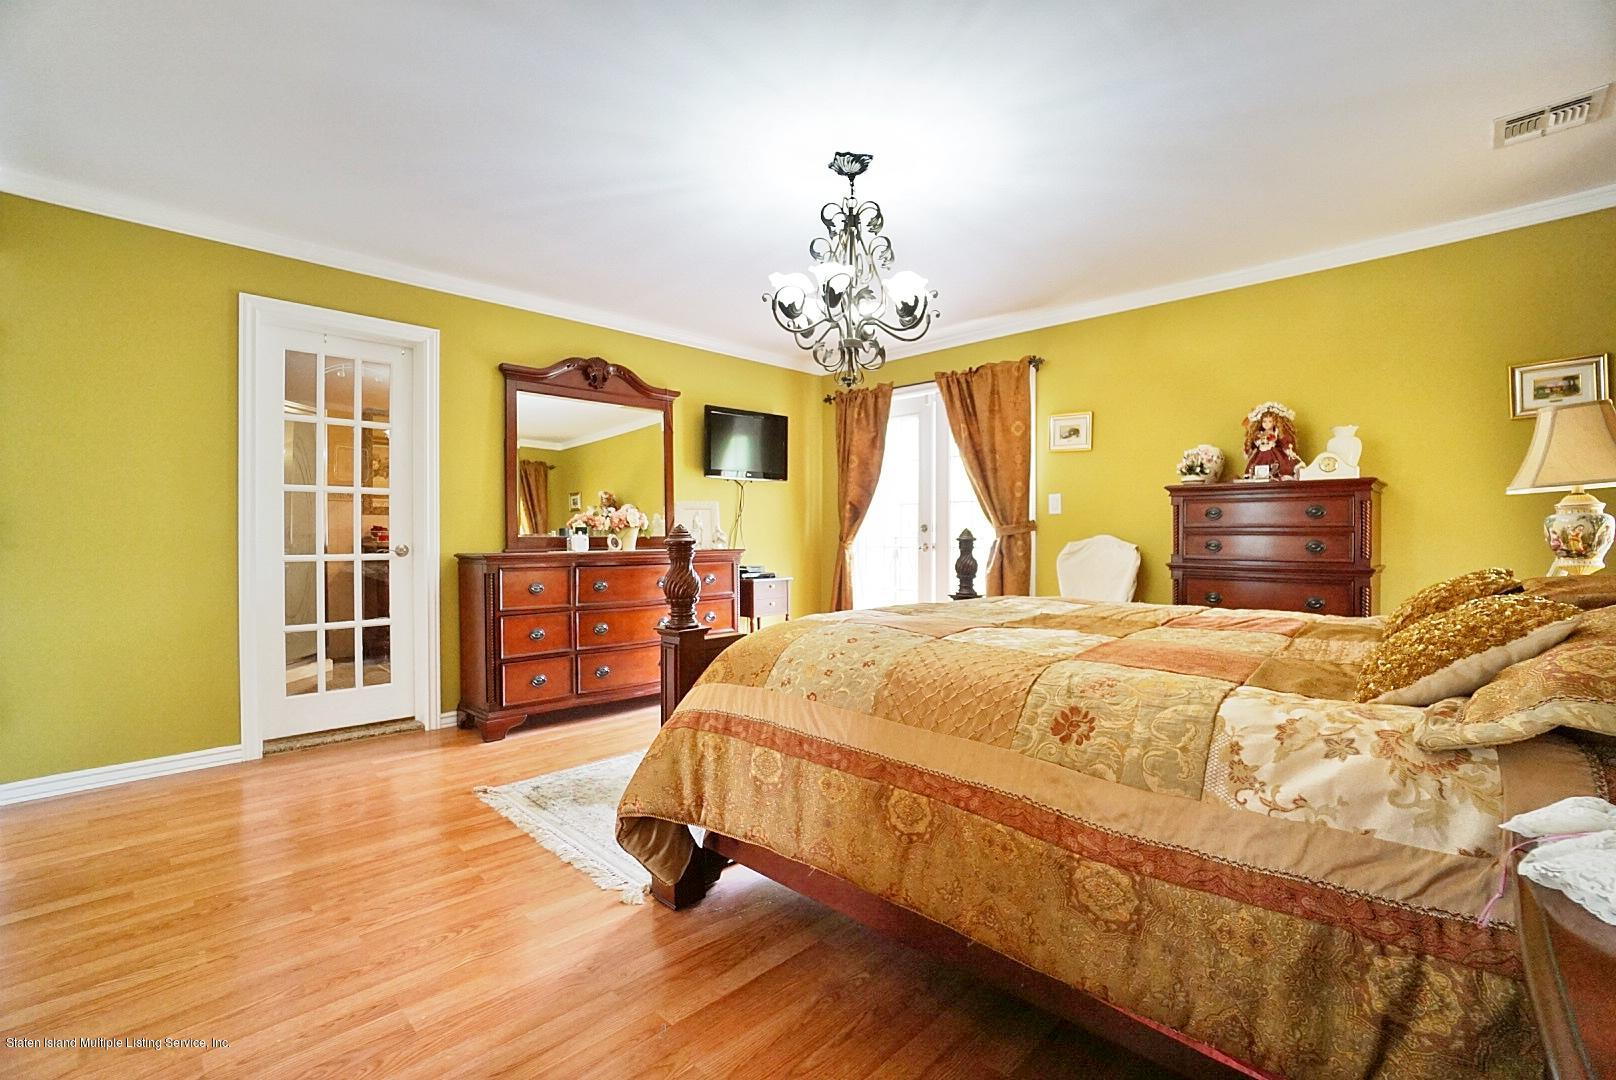 Single Family - Detached 67 Marvin Road  Staten Island, NY 10309, MLS-1128691-22